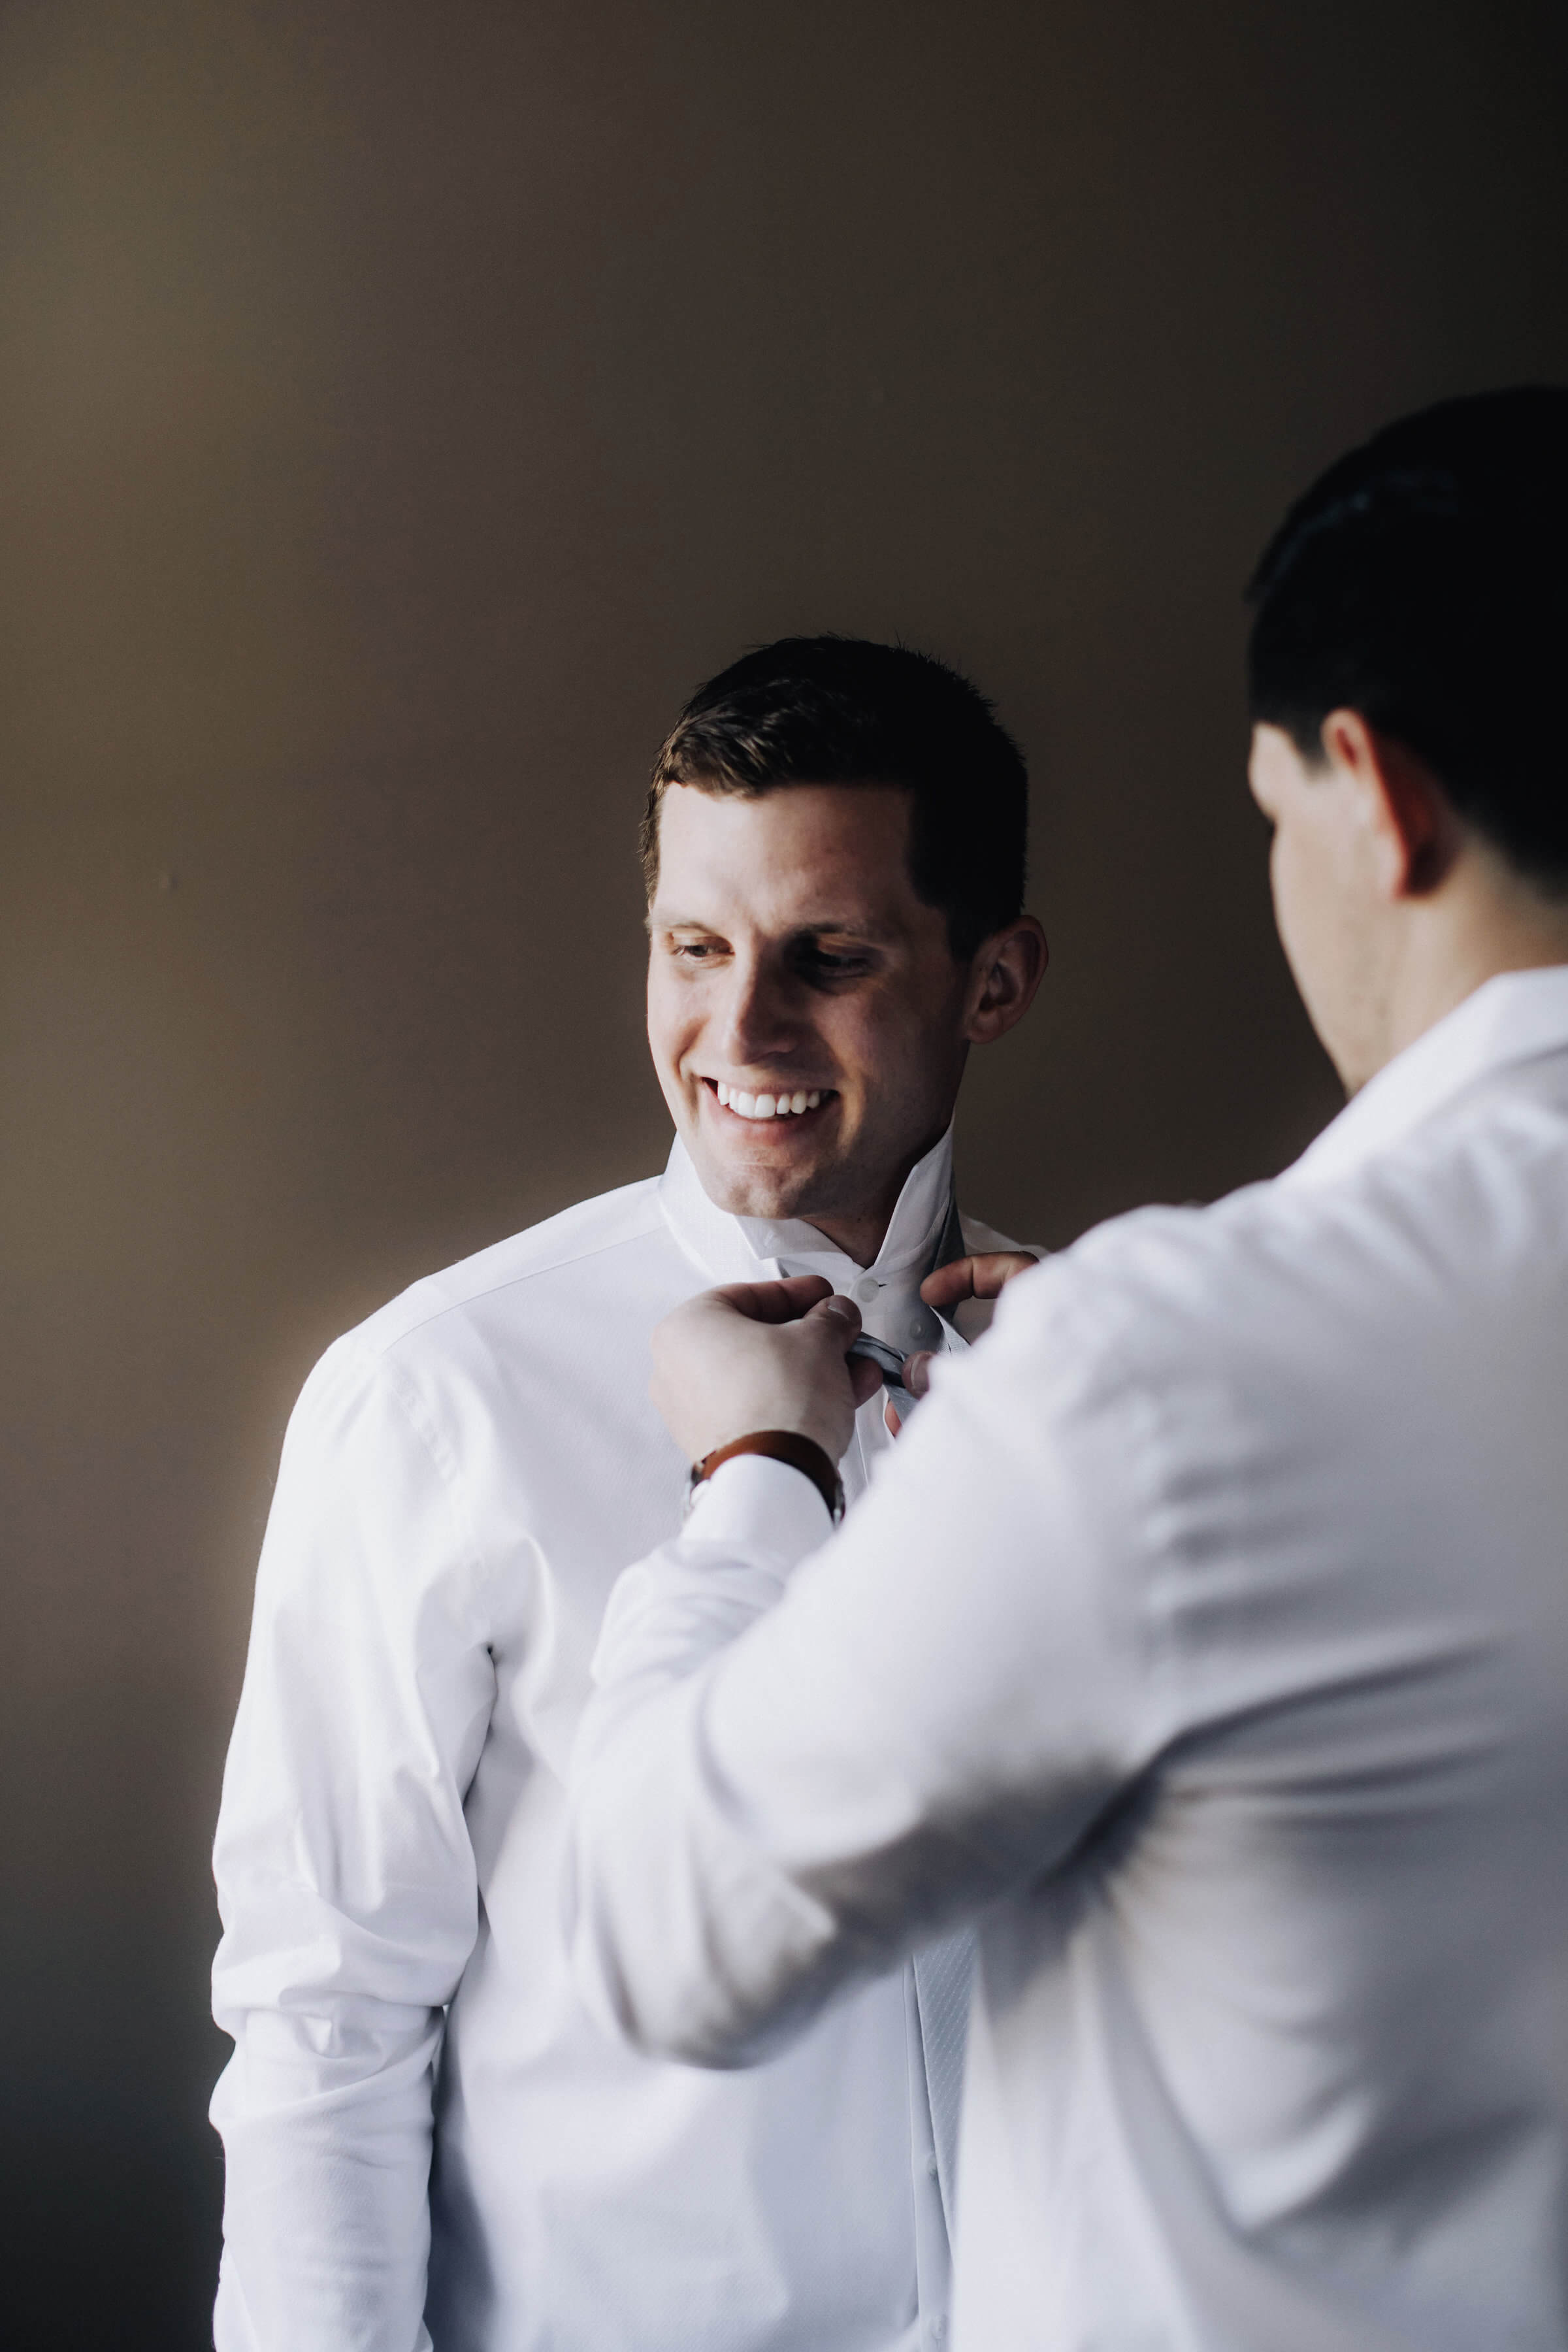 engle-olson-ashley-schyler-wedding-matt-lien-photography-2.jpg